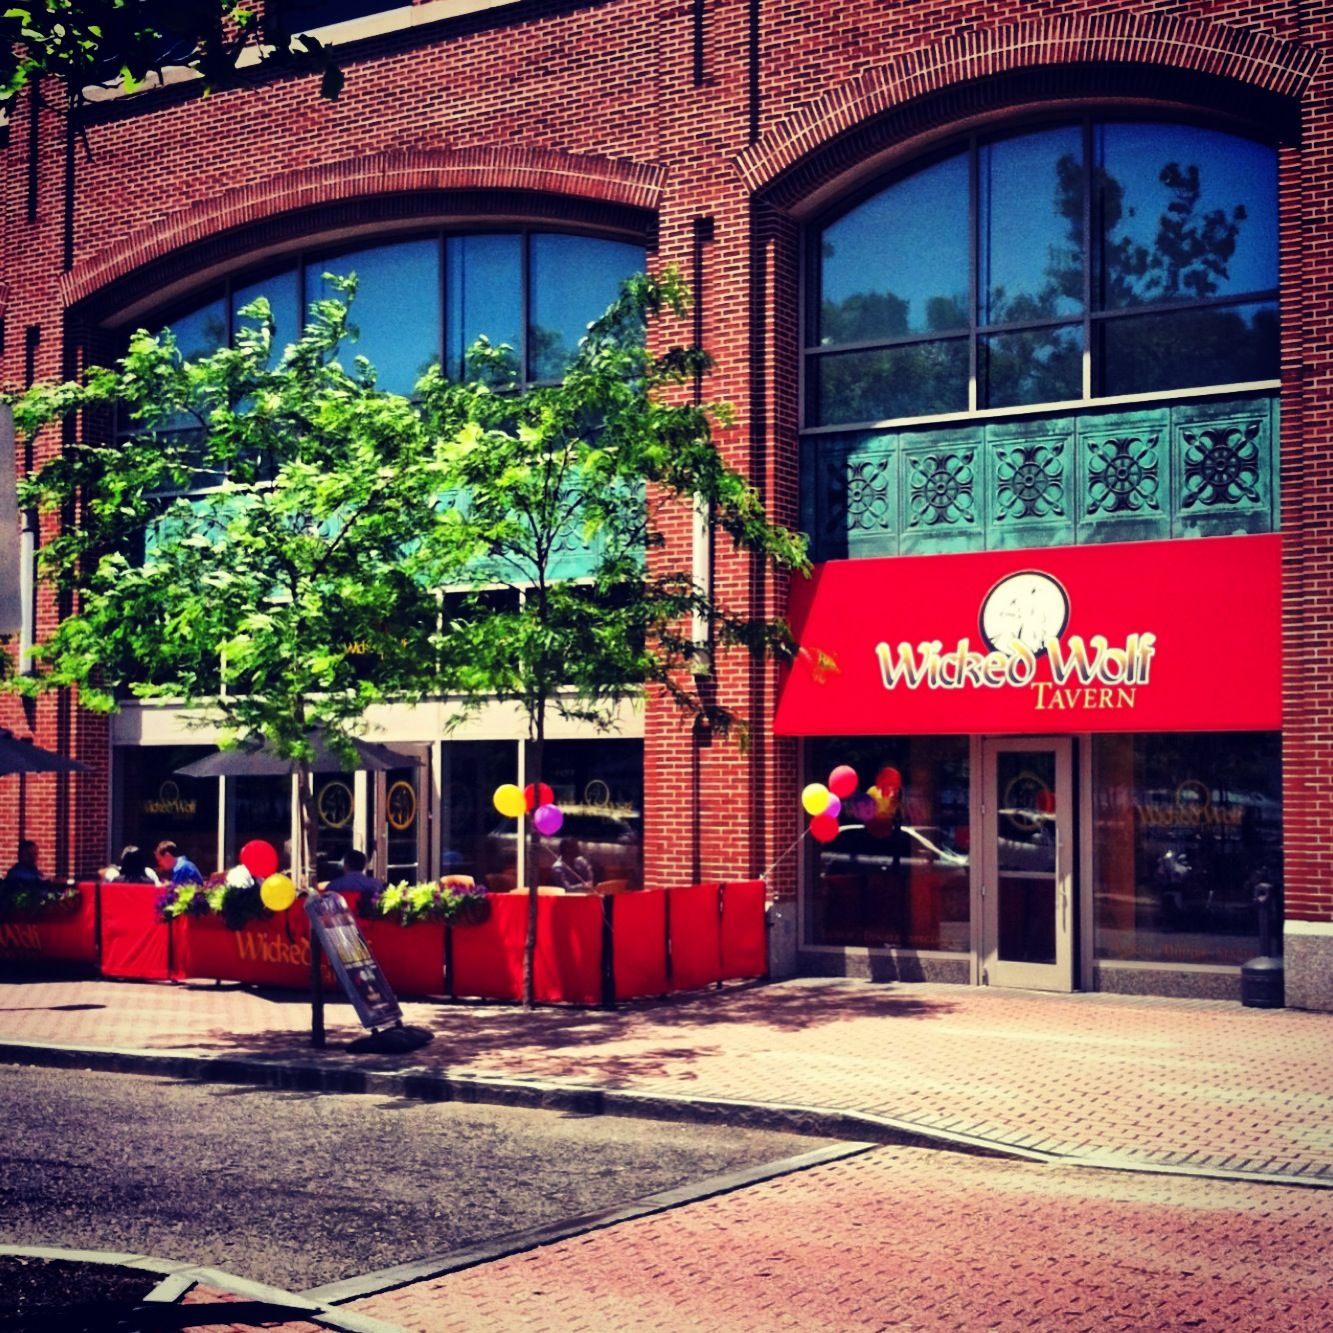 11 Hoboken Bars To Watch Football According To Your Preference Hoboken Bars Hoboken Cool Bars